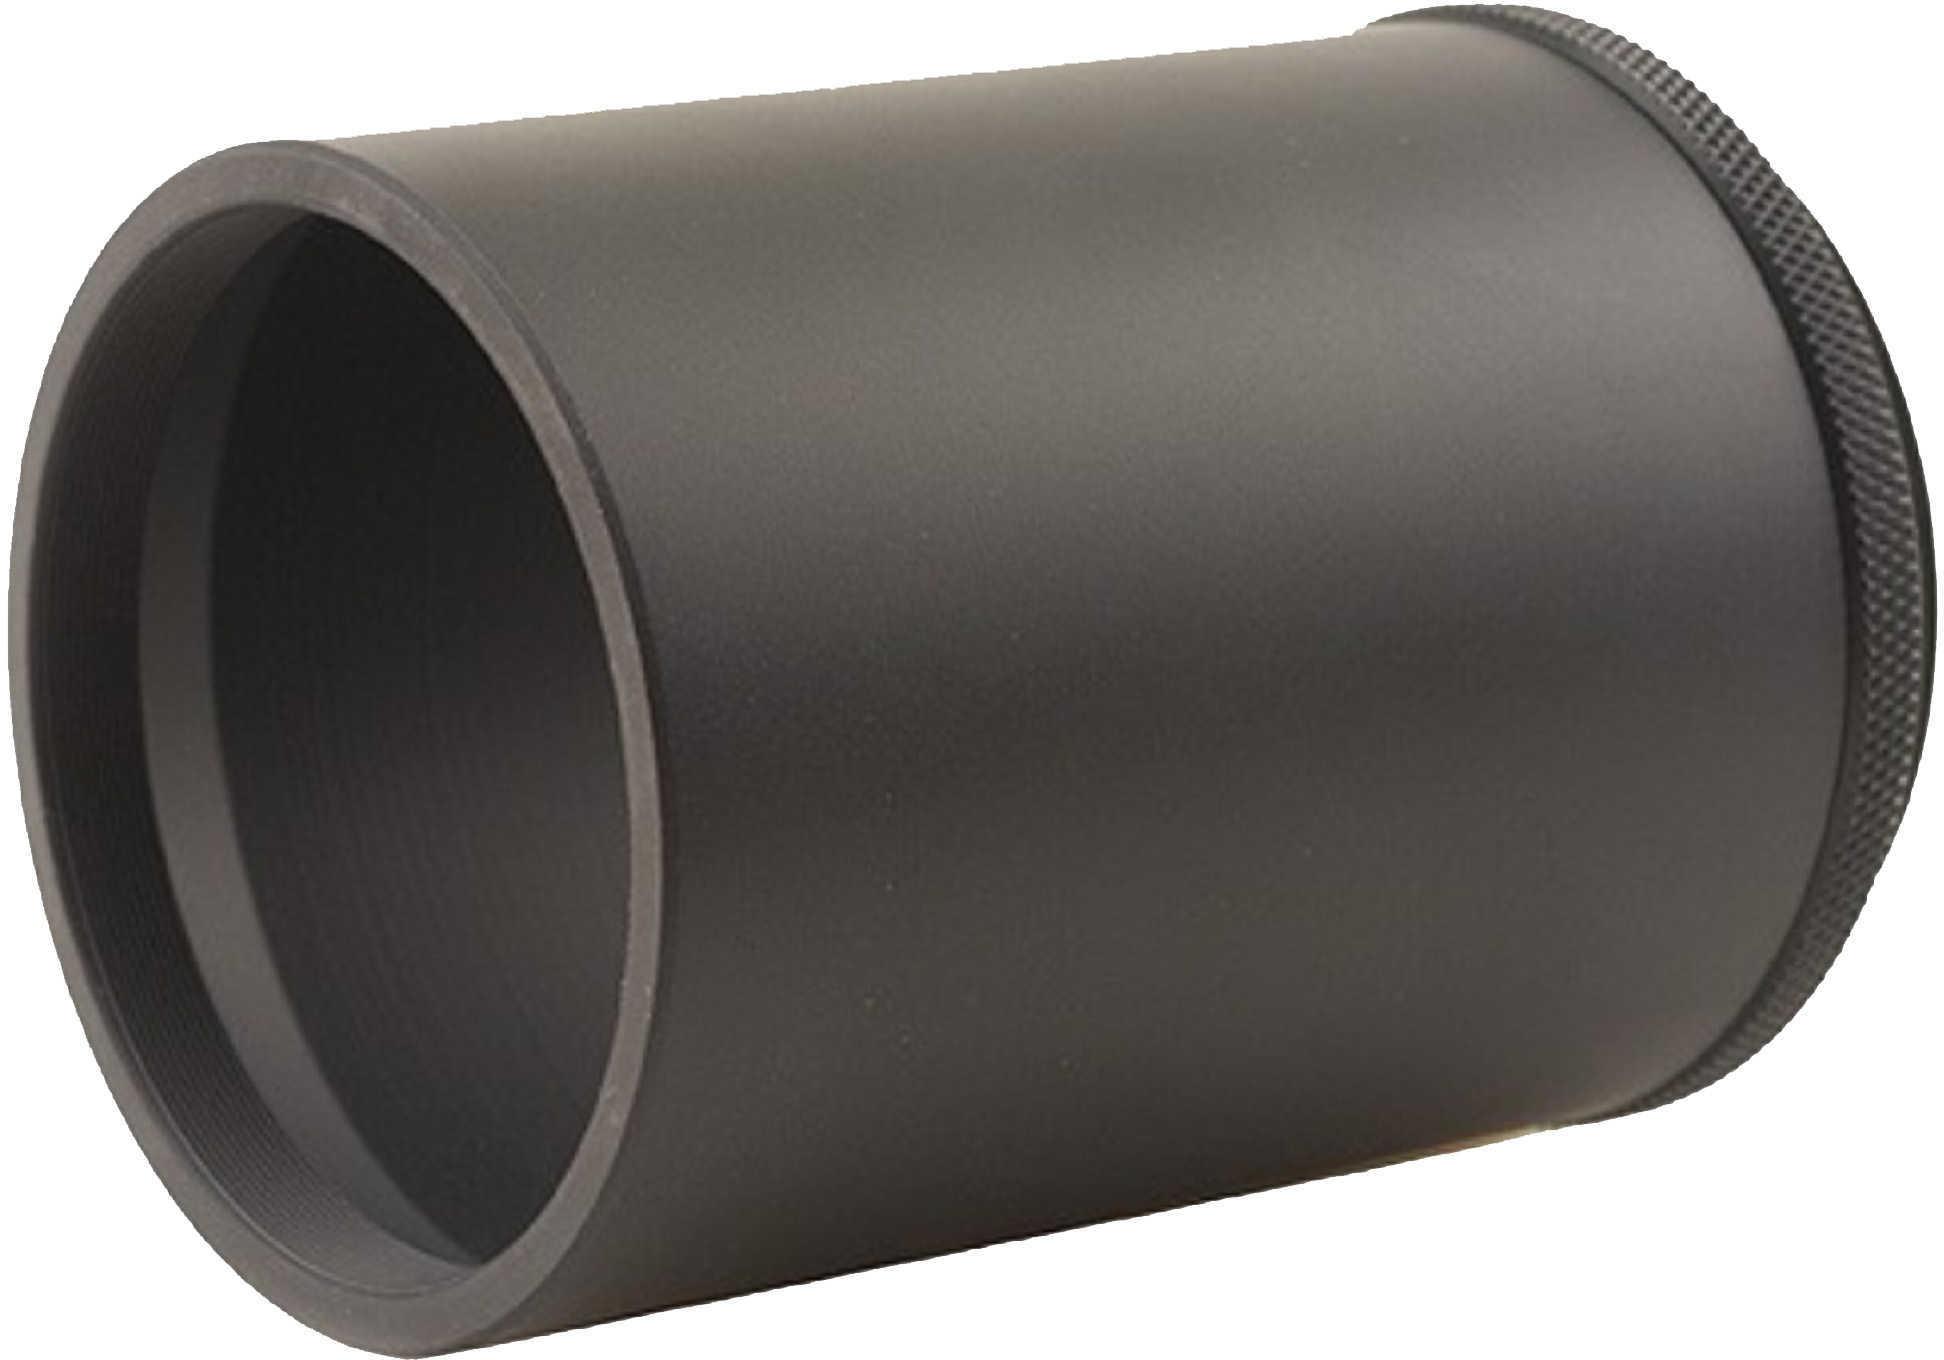 Burris Sunshade MTAC 4.5-14X Stackable, E1, Ff II Md: 626035